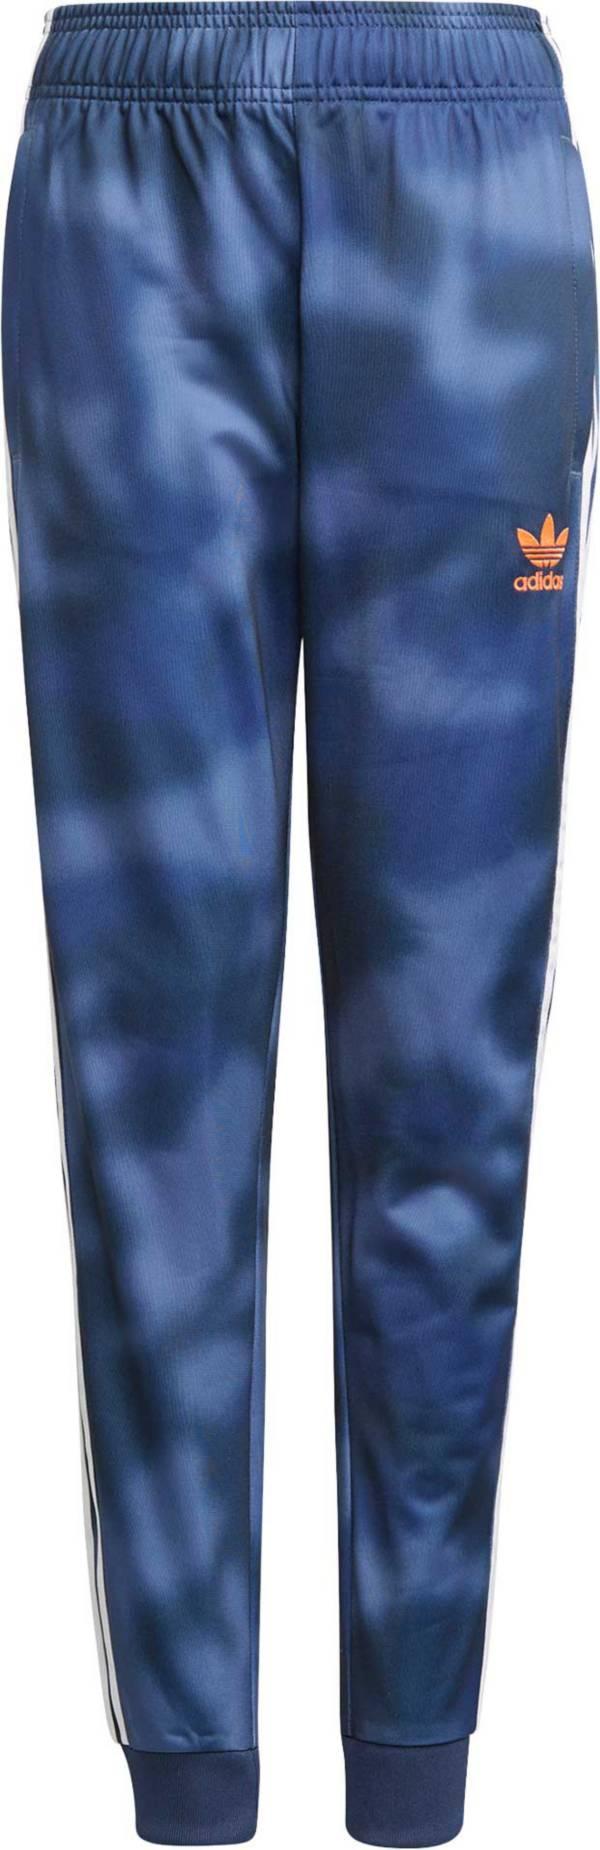 adidas Boys' All Over Print Camo Superstar Pants product image